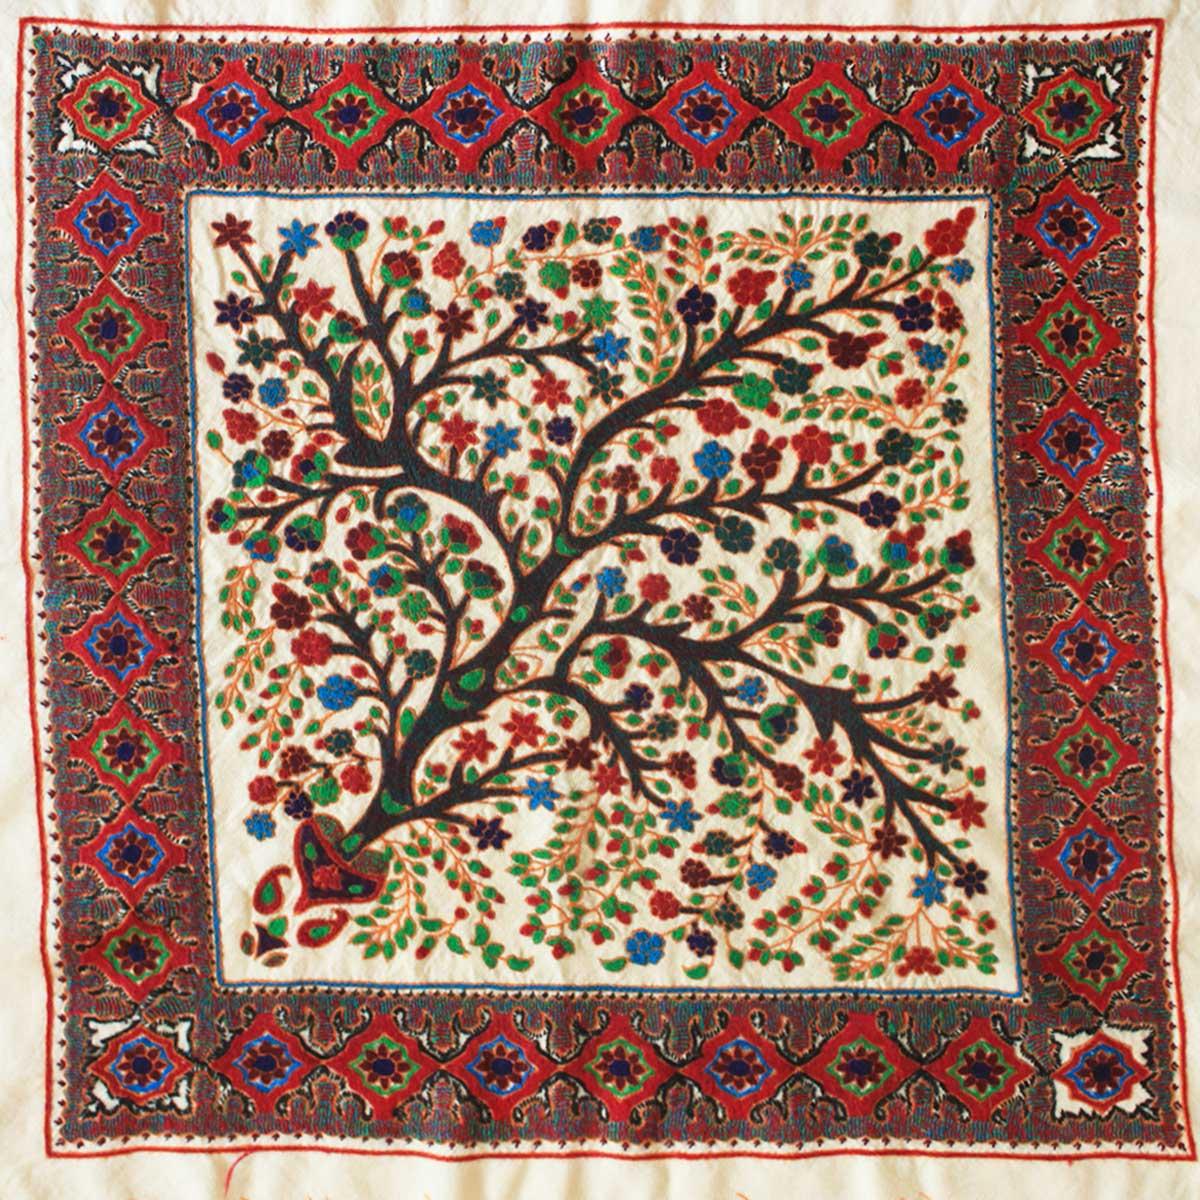 پته کرمان - محصول سرسرابازار